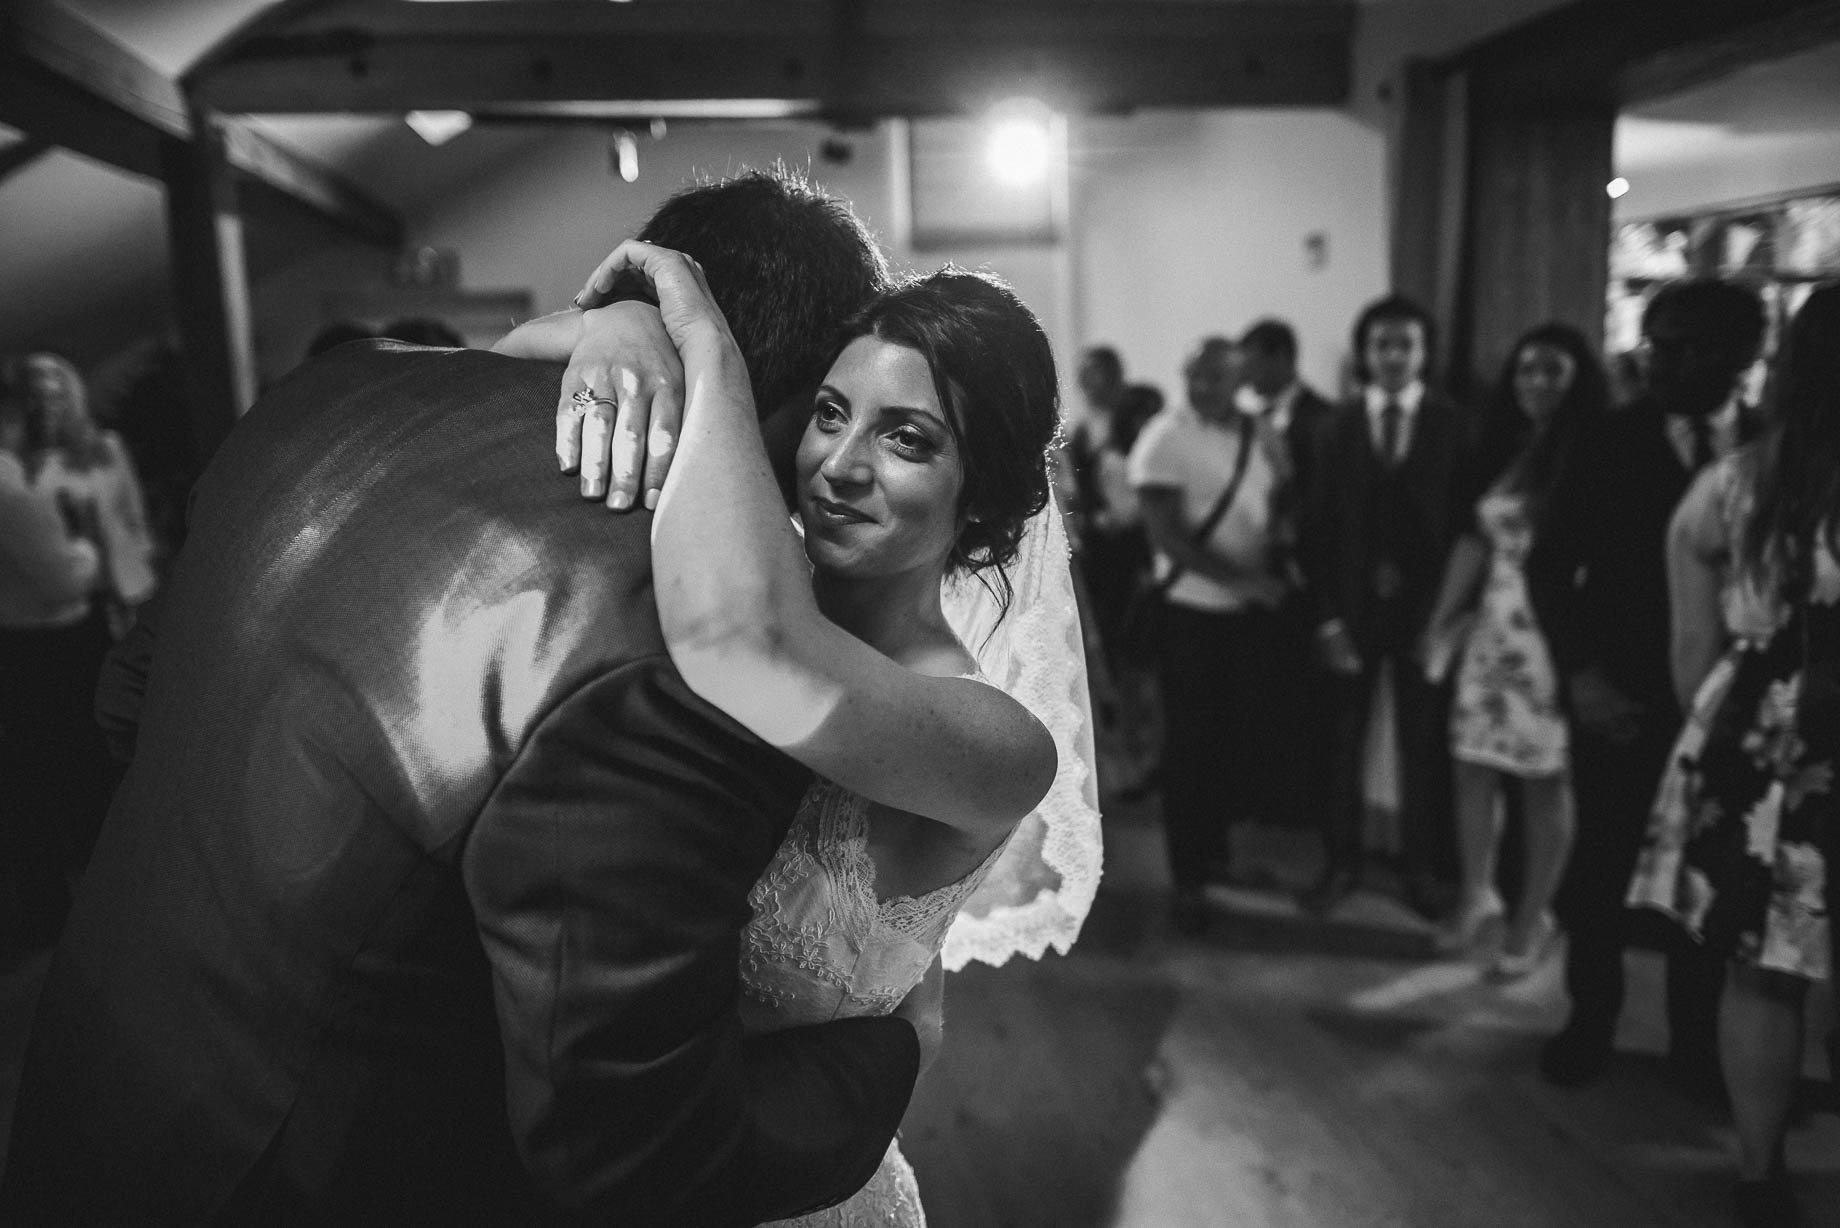 Gaynes Park wedding photography - Guy Collier Photography - Rachel and Jon (163 of 169)